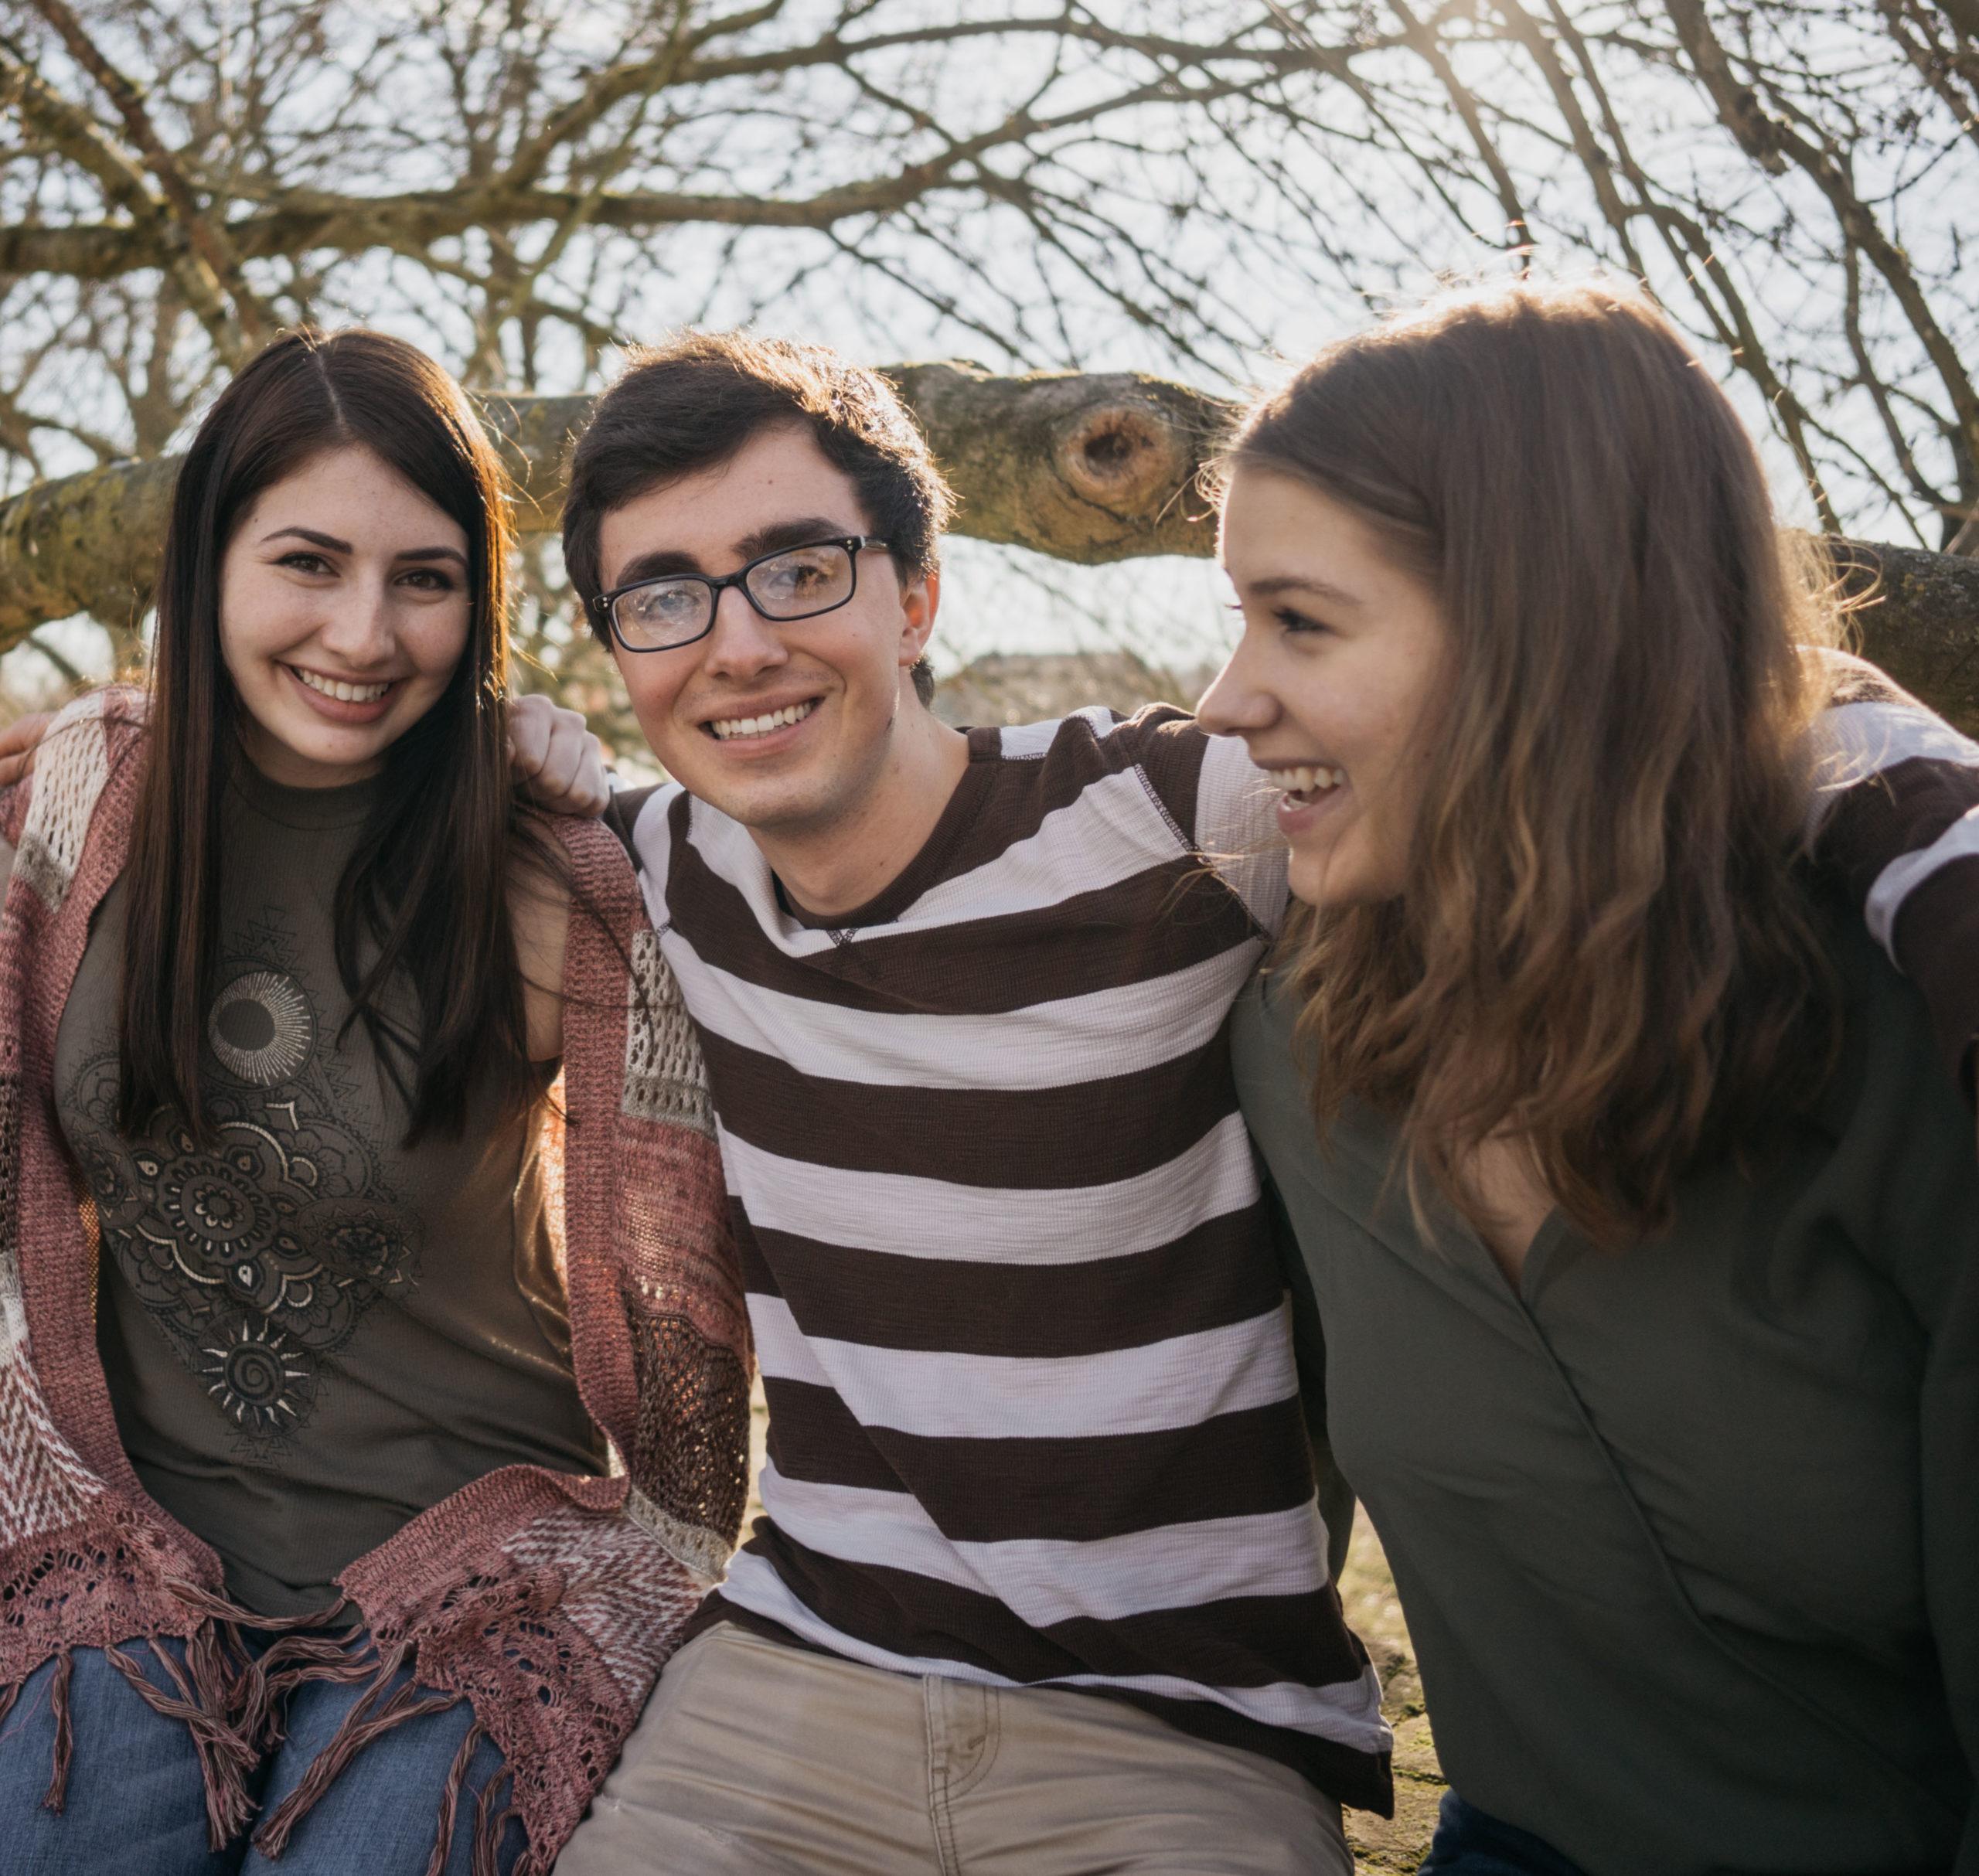 Maastricht Summer School students fall